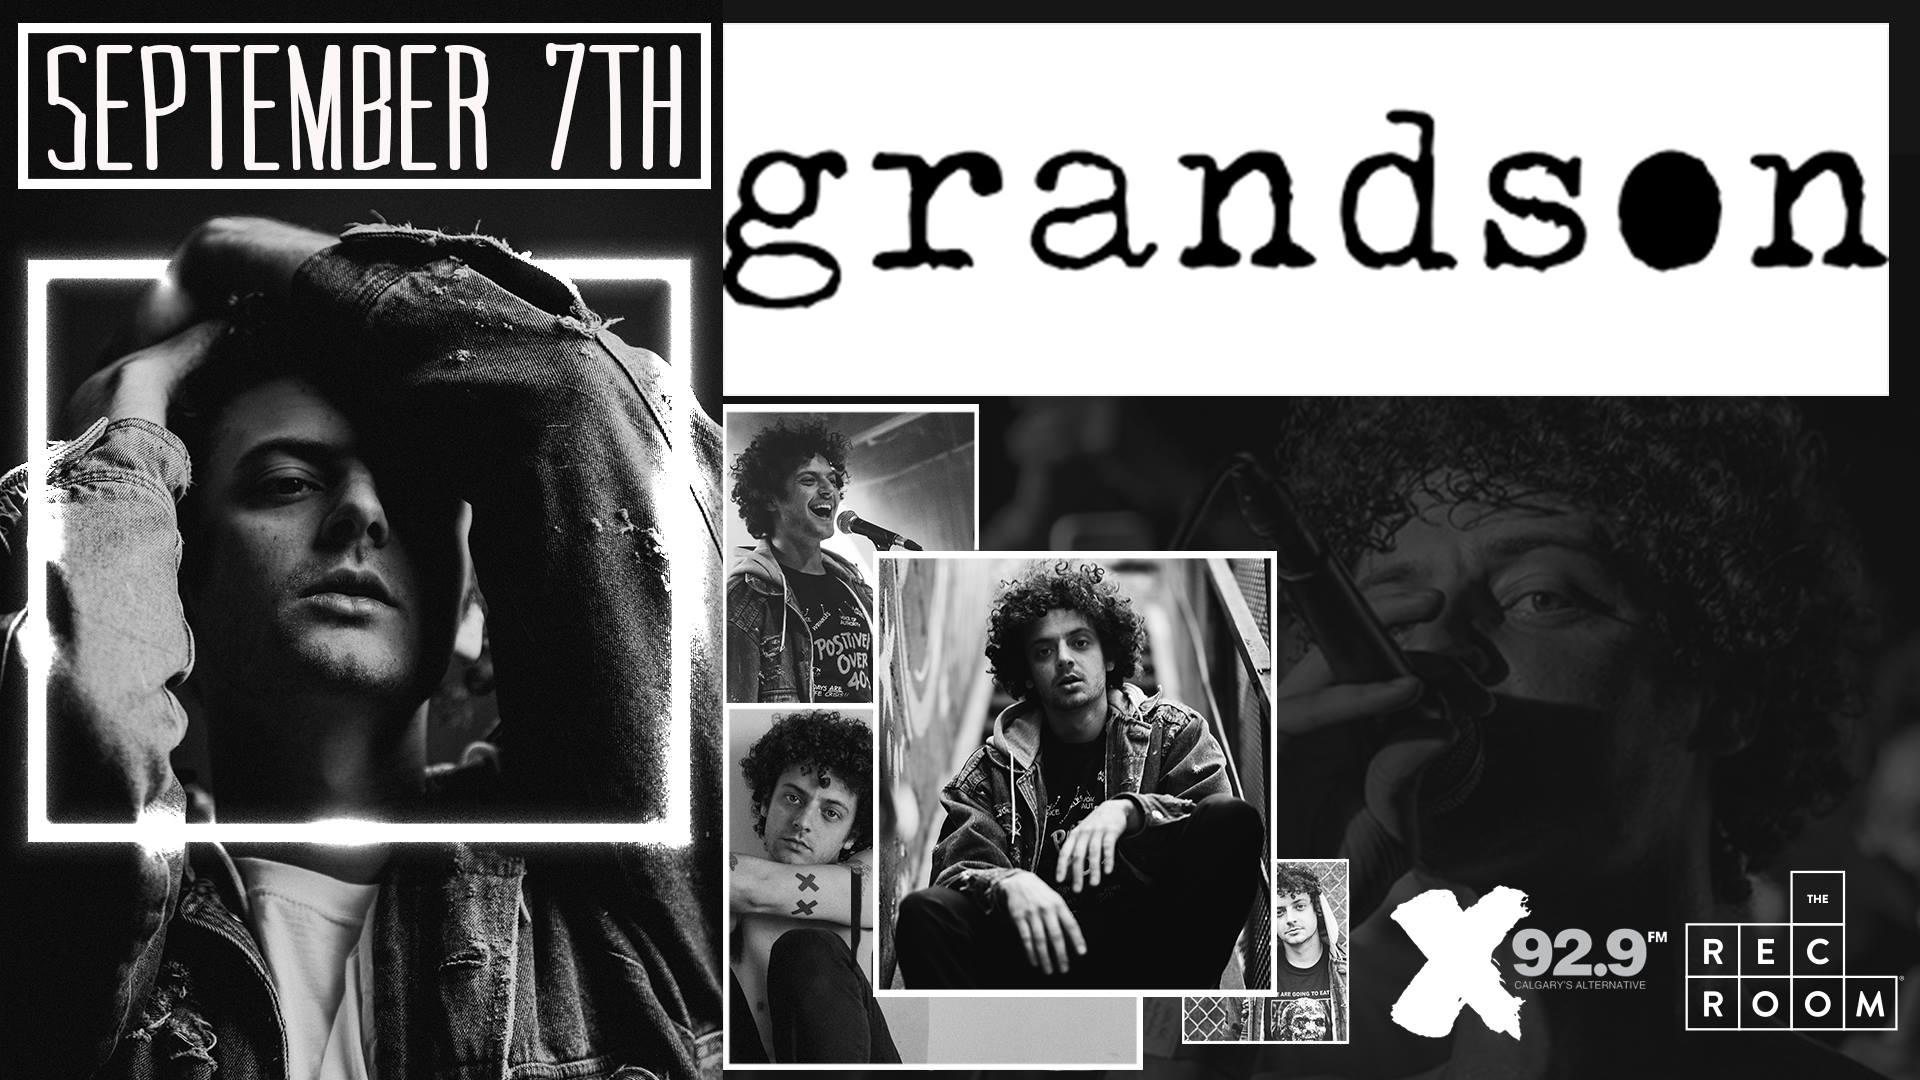 Friday, September 7th @ The Rec Room Calgary w/ grandson + Open Air -